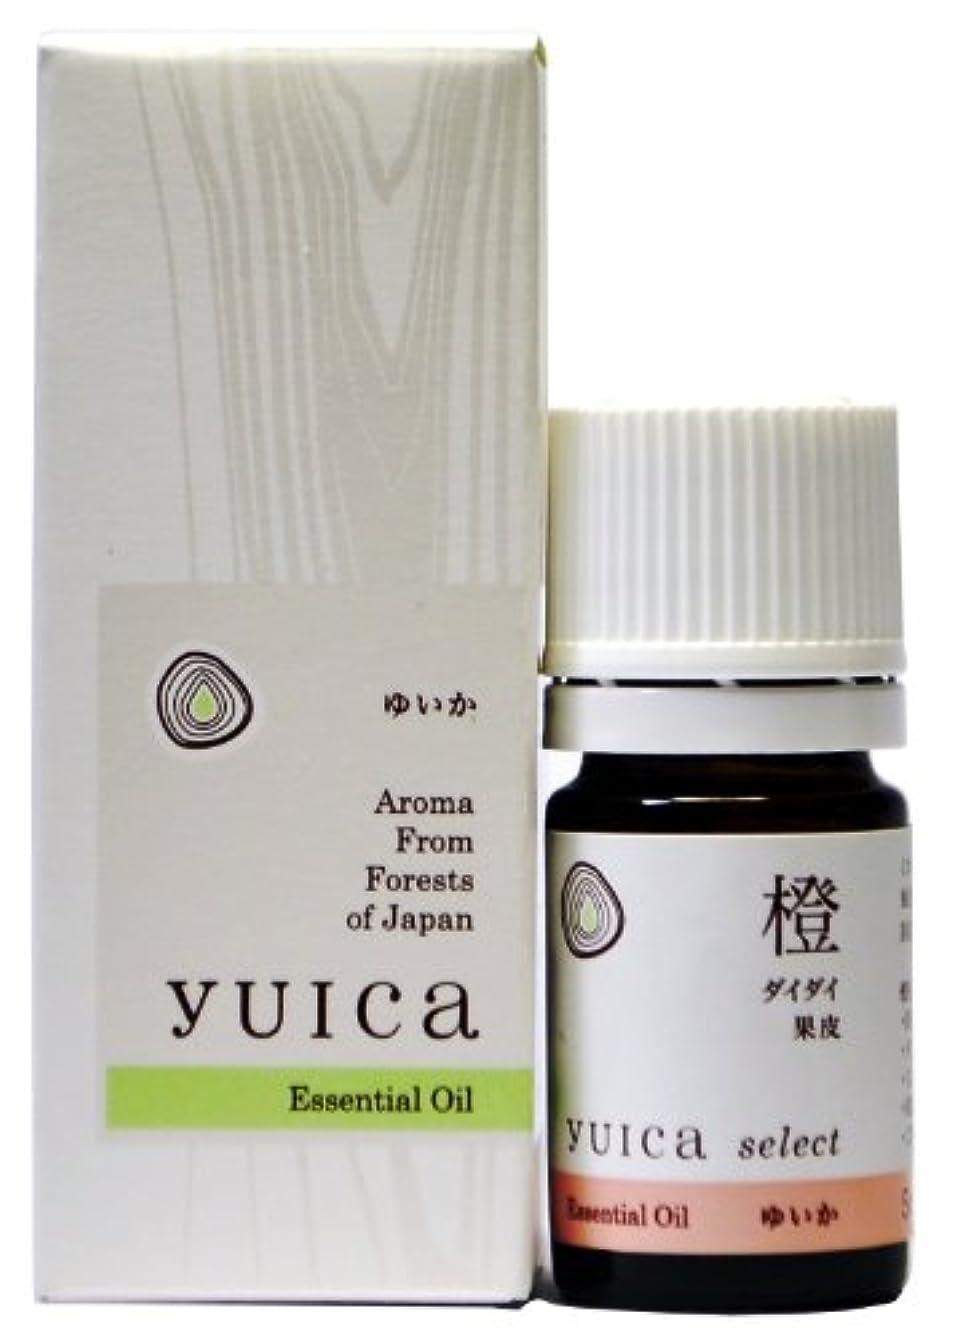 yuica select エッセンシャルオイル ダイダイ(果皮部) 5mL